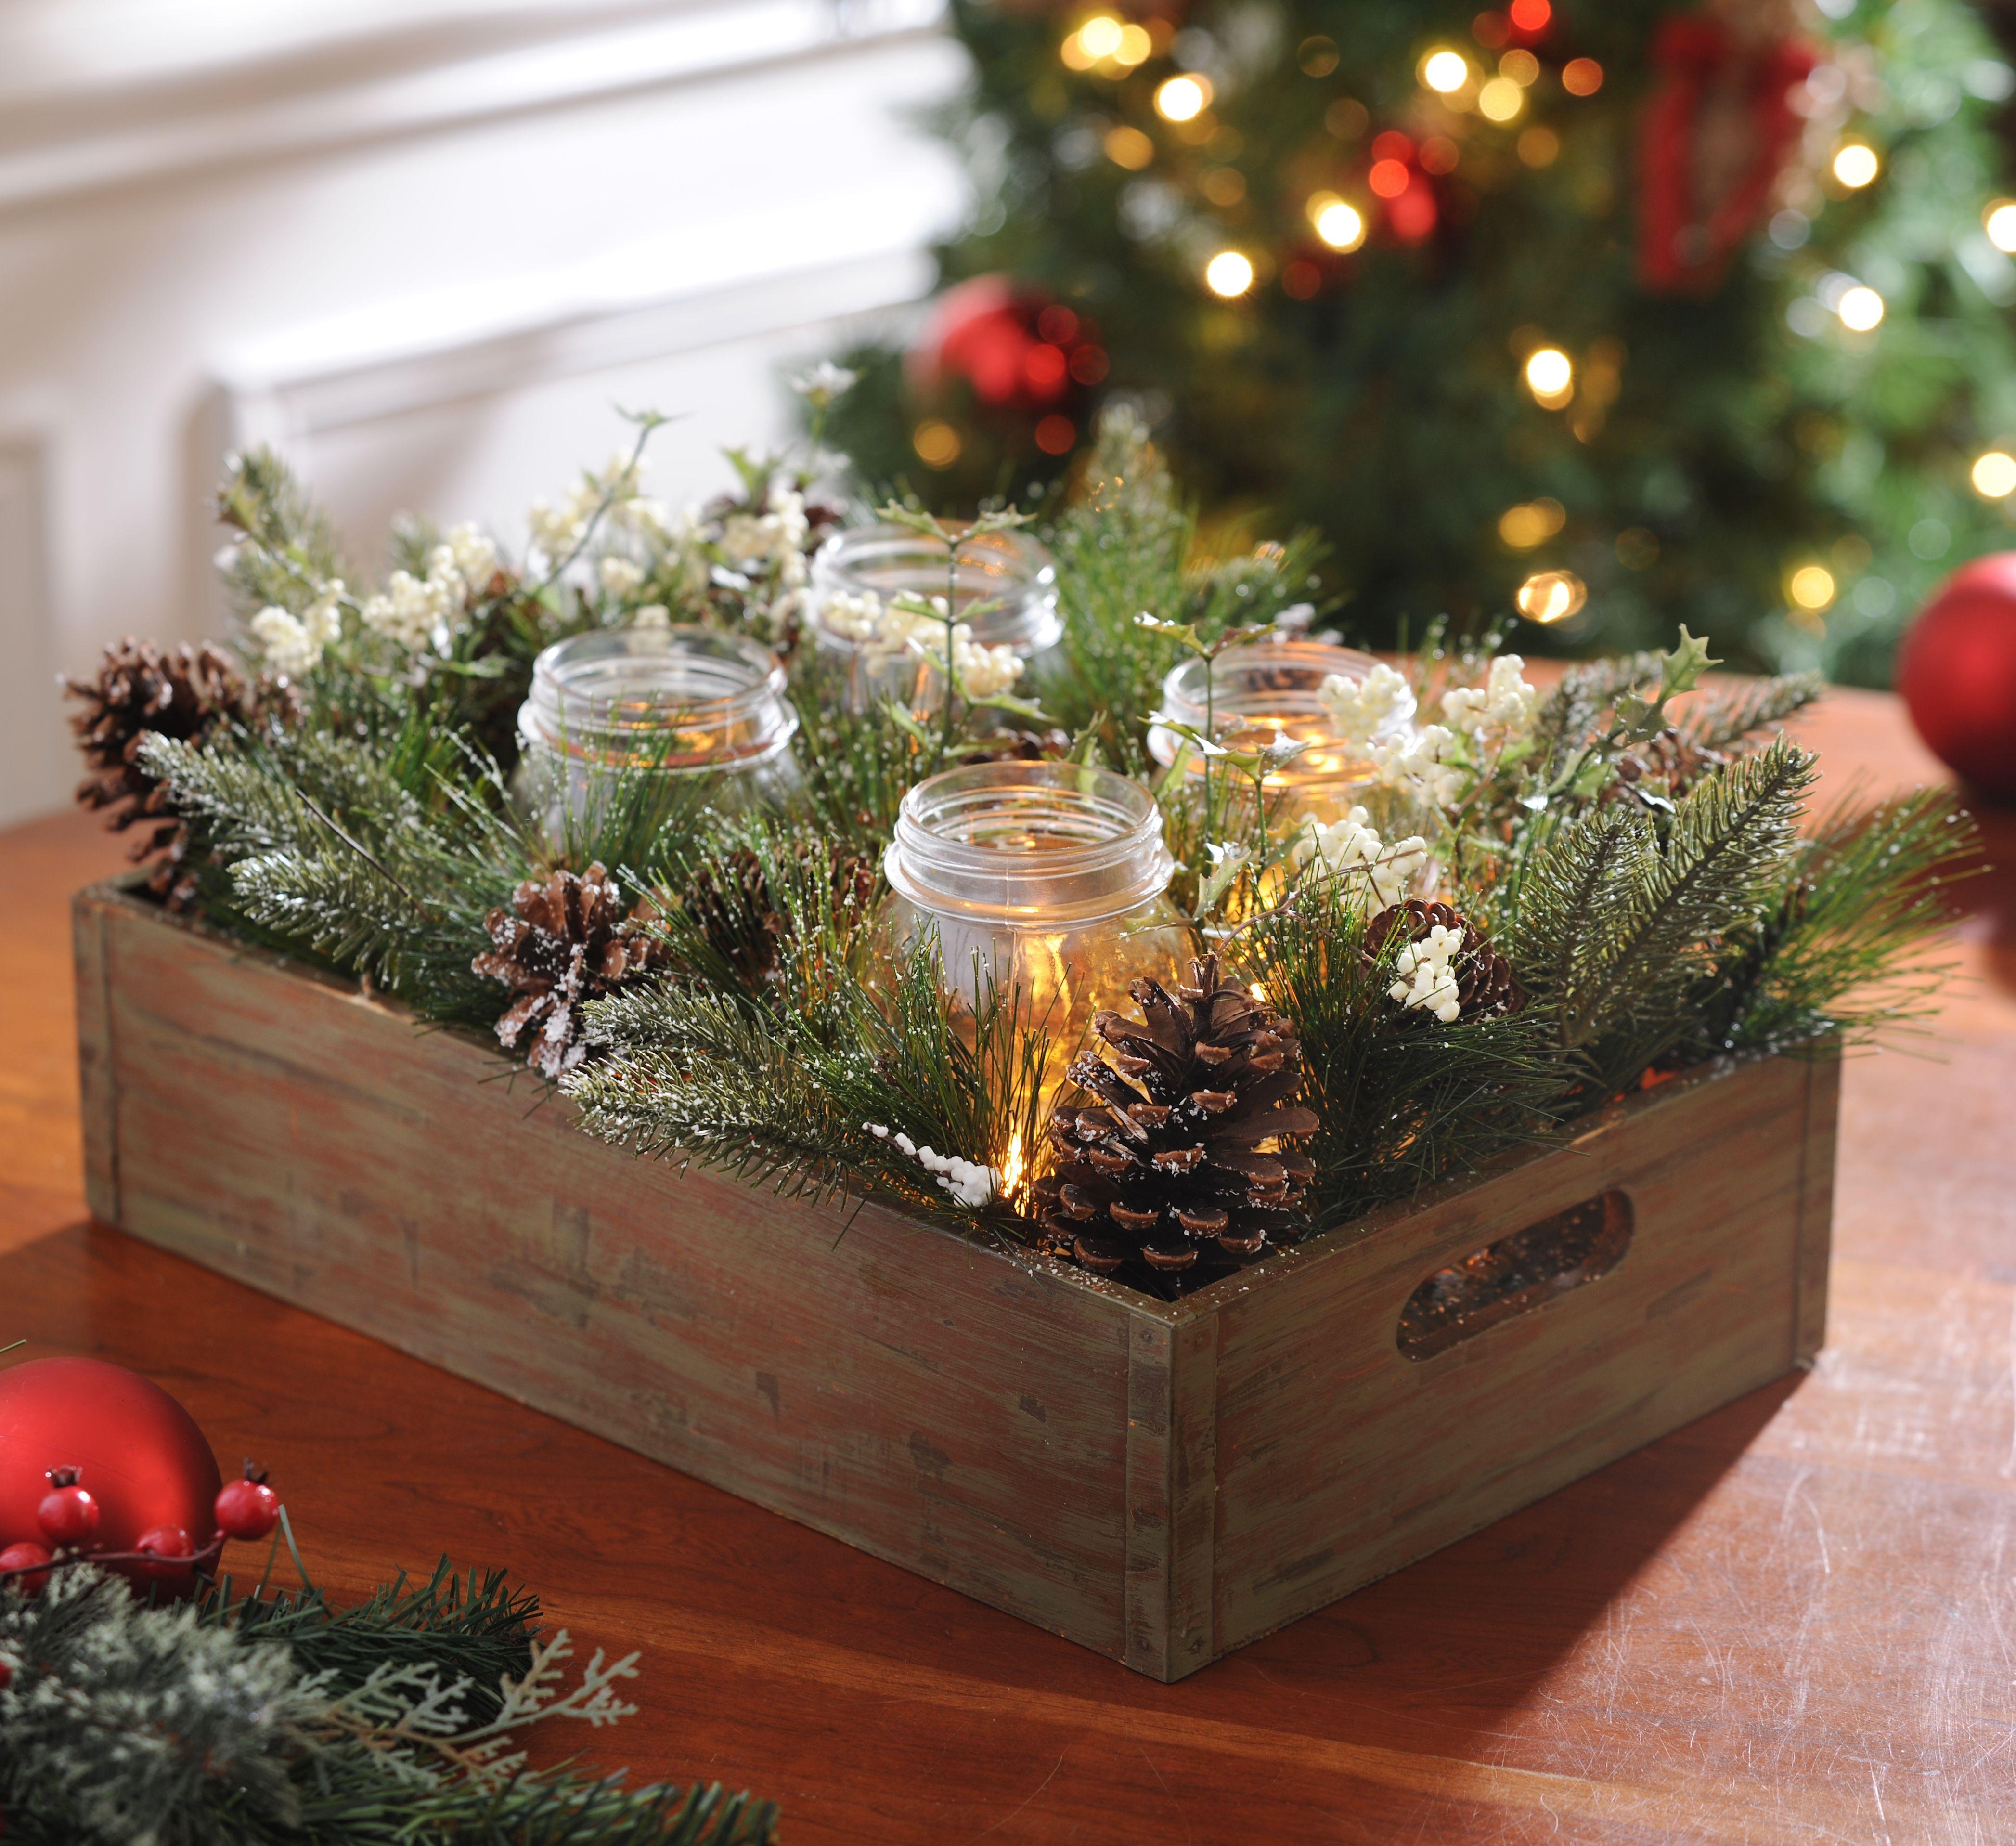 Wonderful How To Create A Festive Holiday Ready Home